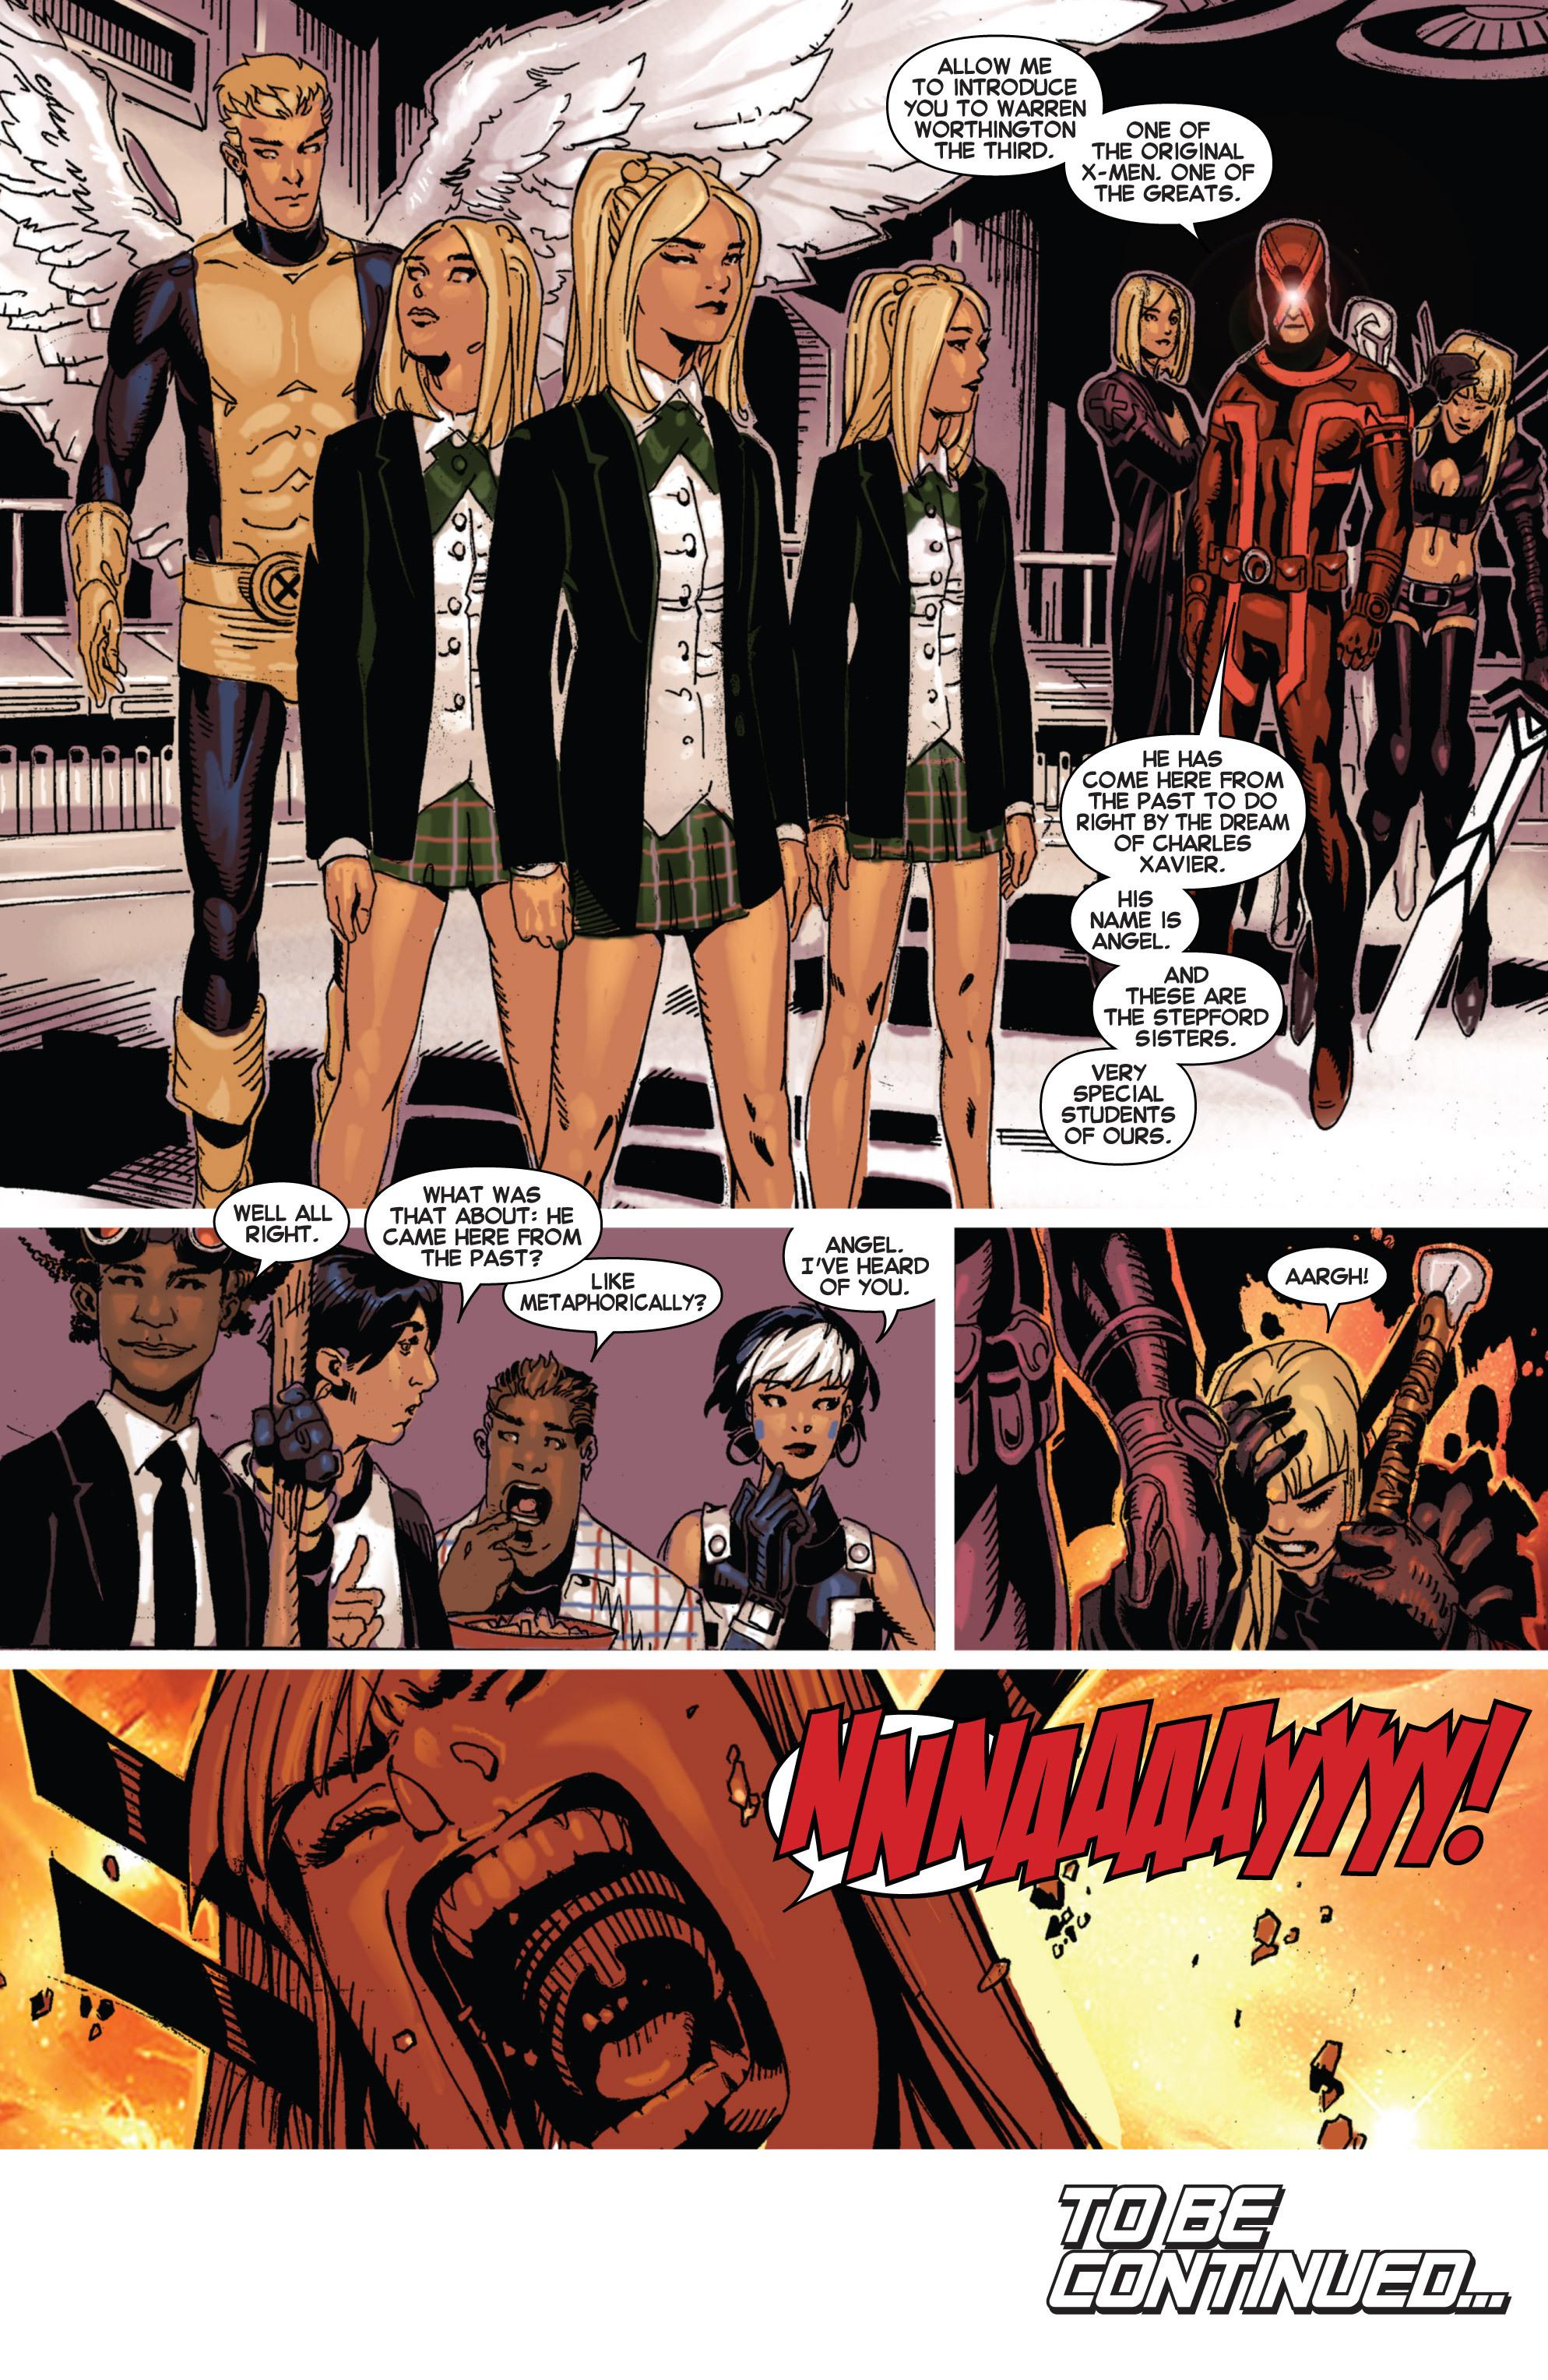 Read online Uncanny X-Men (2013) comic -  Issue # _TPB 1 - Revolution - 83